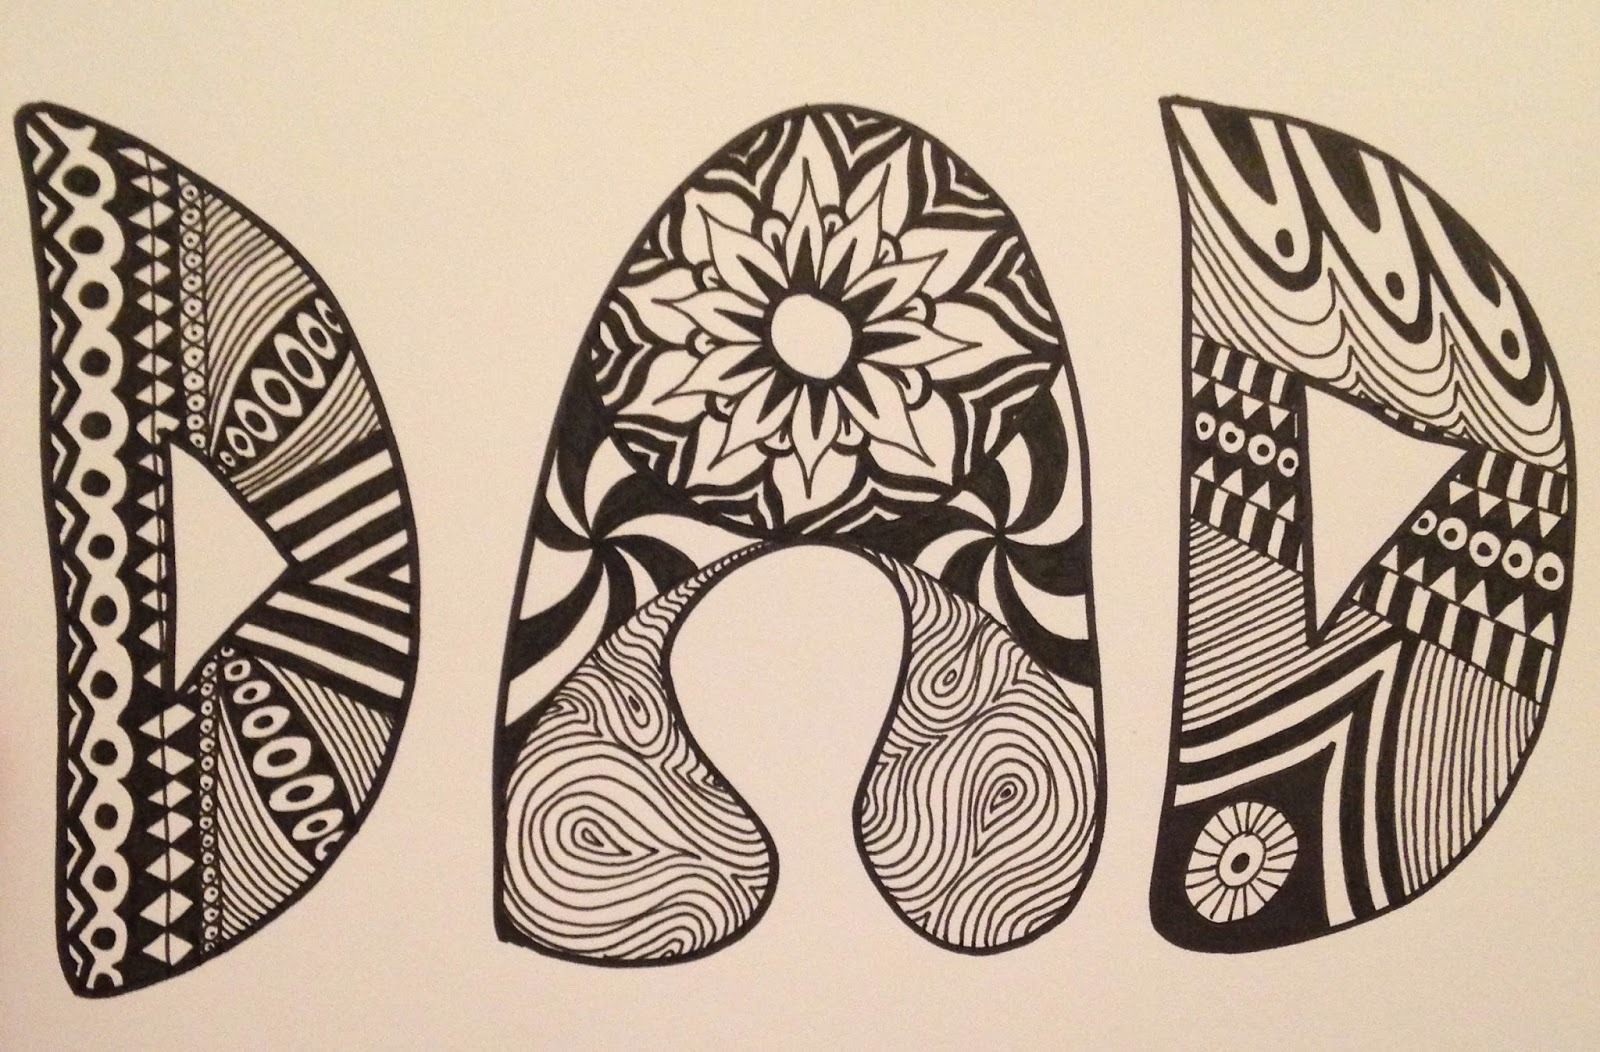 Feeling Fictional Crafting Corner Zentangle Mandala Doodles JPG 1600x1052 Ideas Birthday Cards Happy Creative